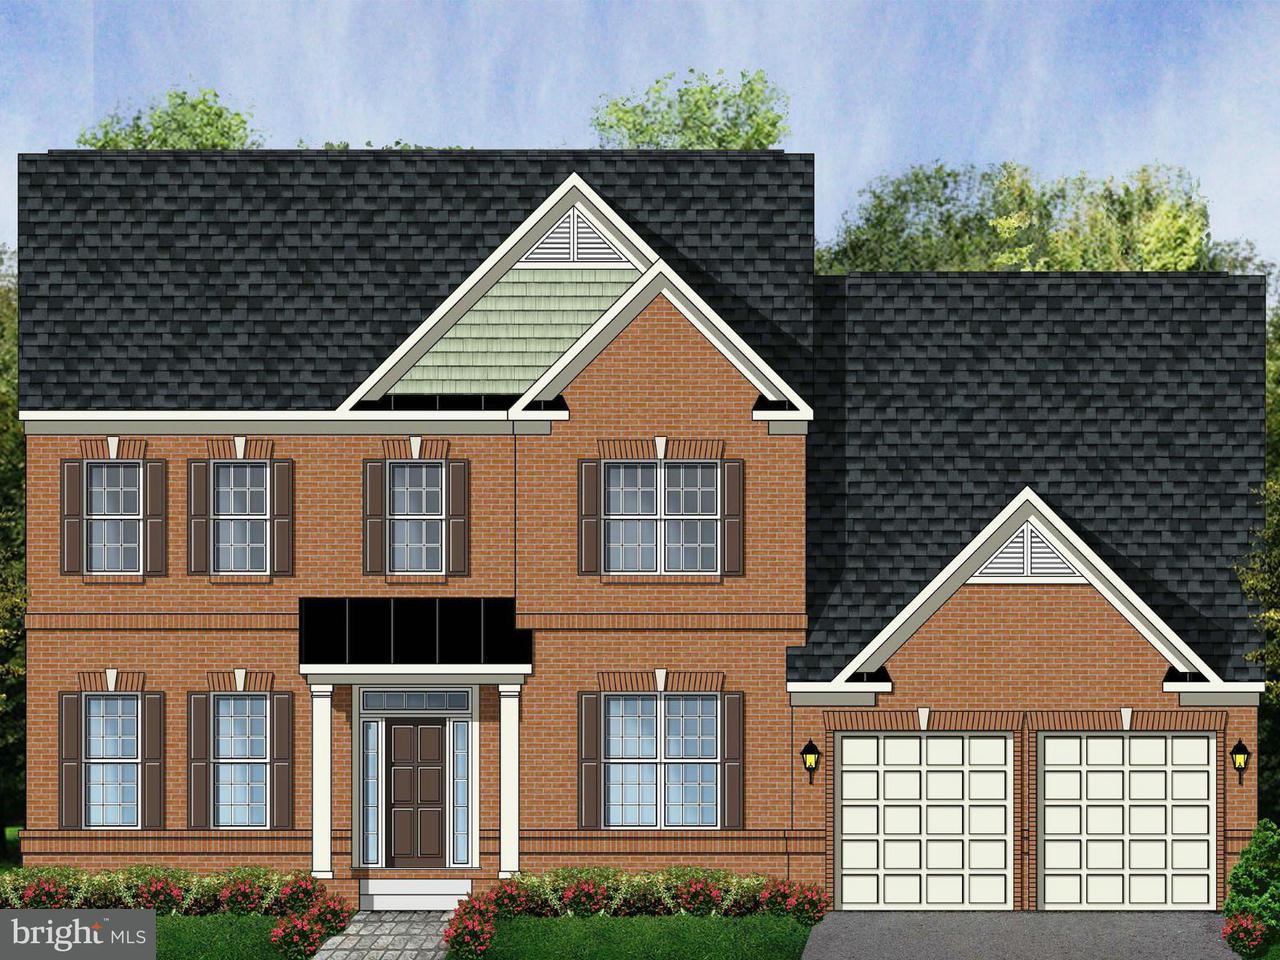 Single Family Home for Sale at 2815 TROTTER PARK Lane 2815 TROTTER PARK Lane Glenarden, Maryland 20706 United States